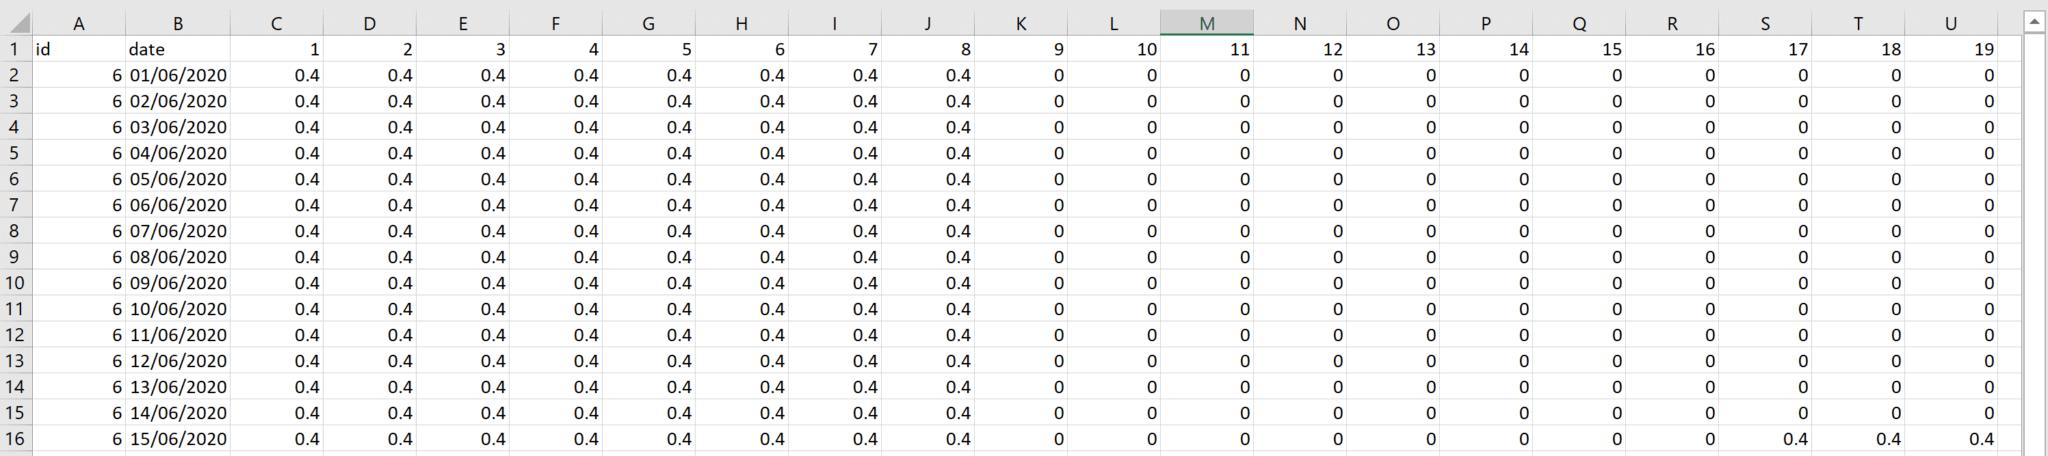 hark platofrm column data with headers